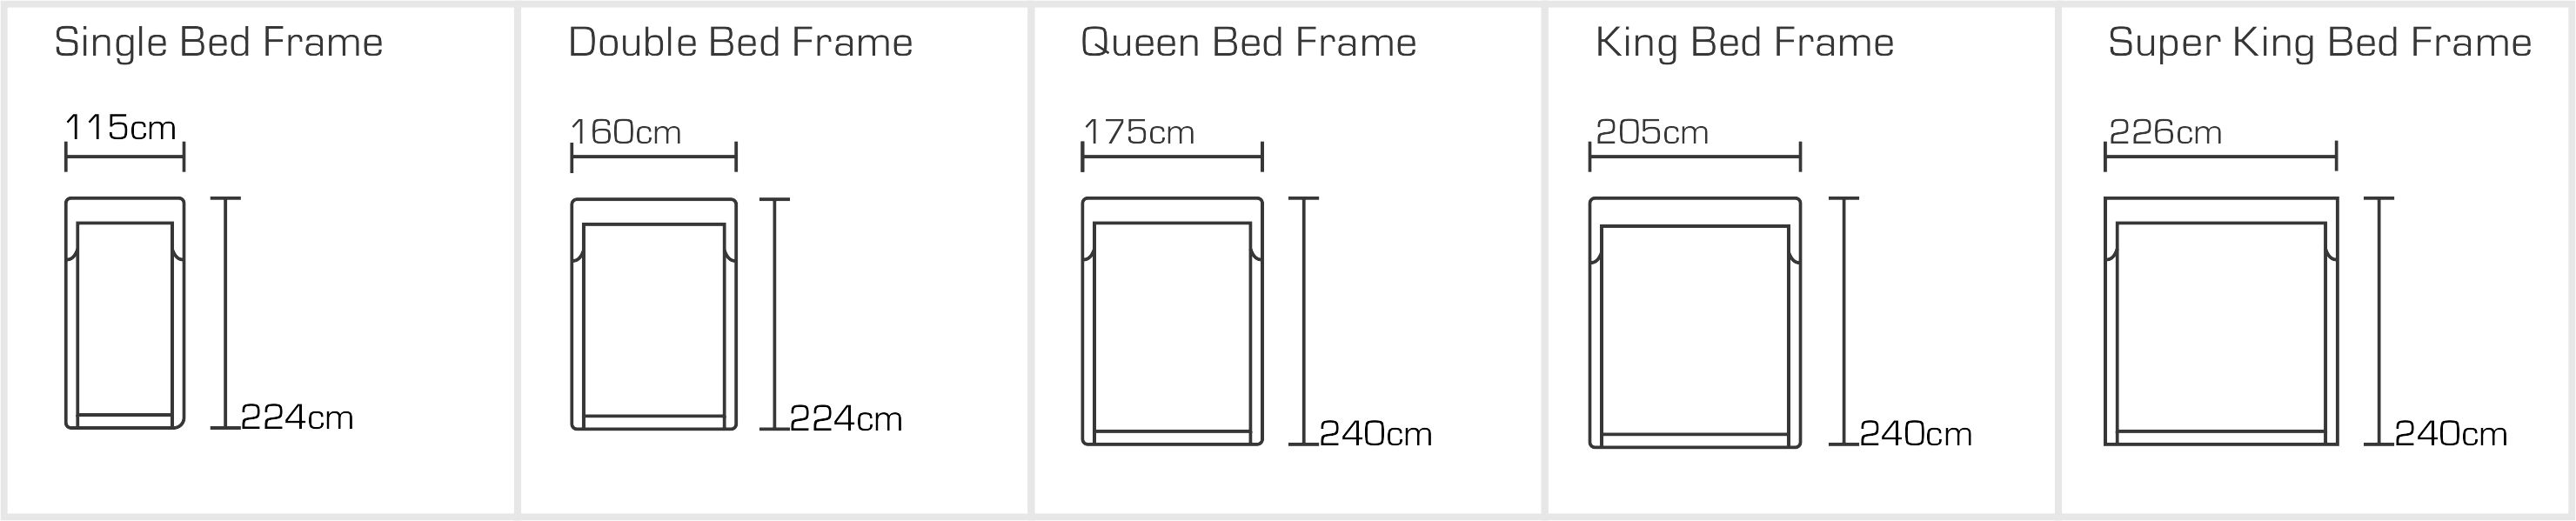 Amelia Bed Sizes